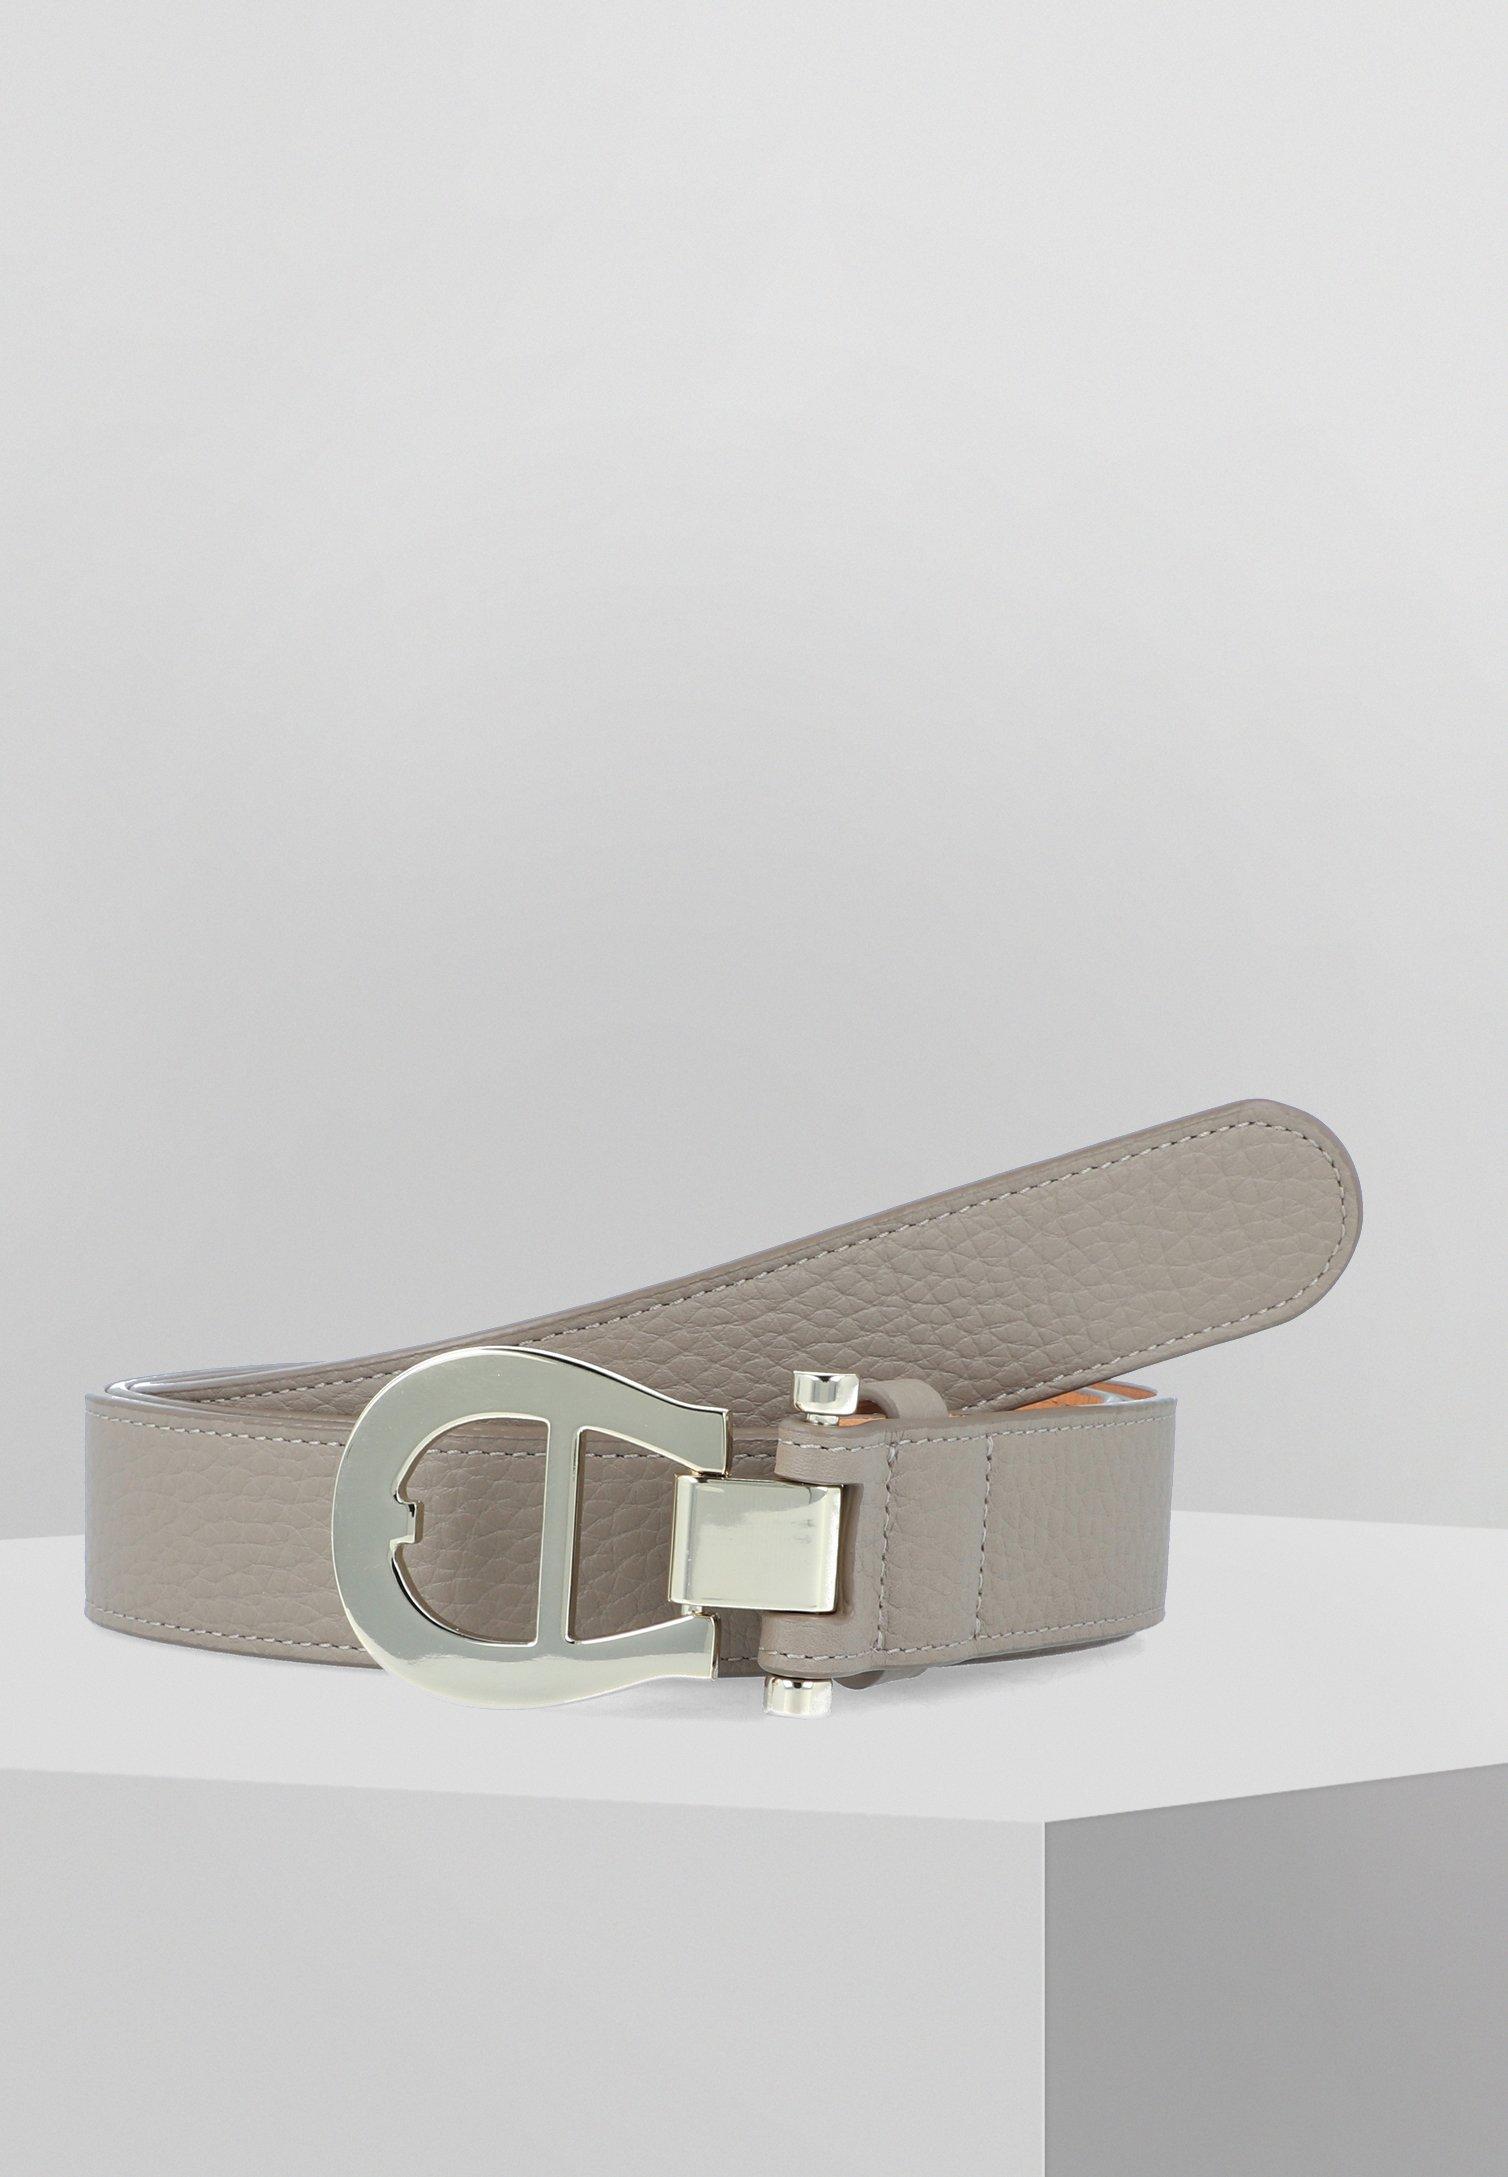 Aigner Belt - feather grey